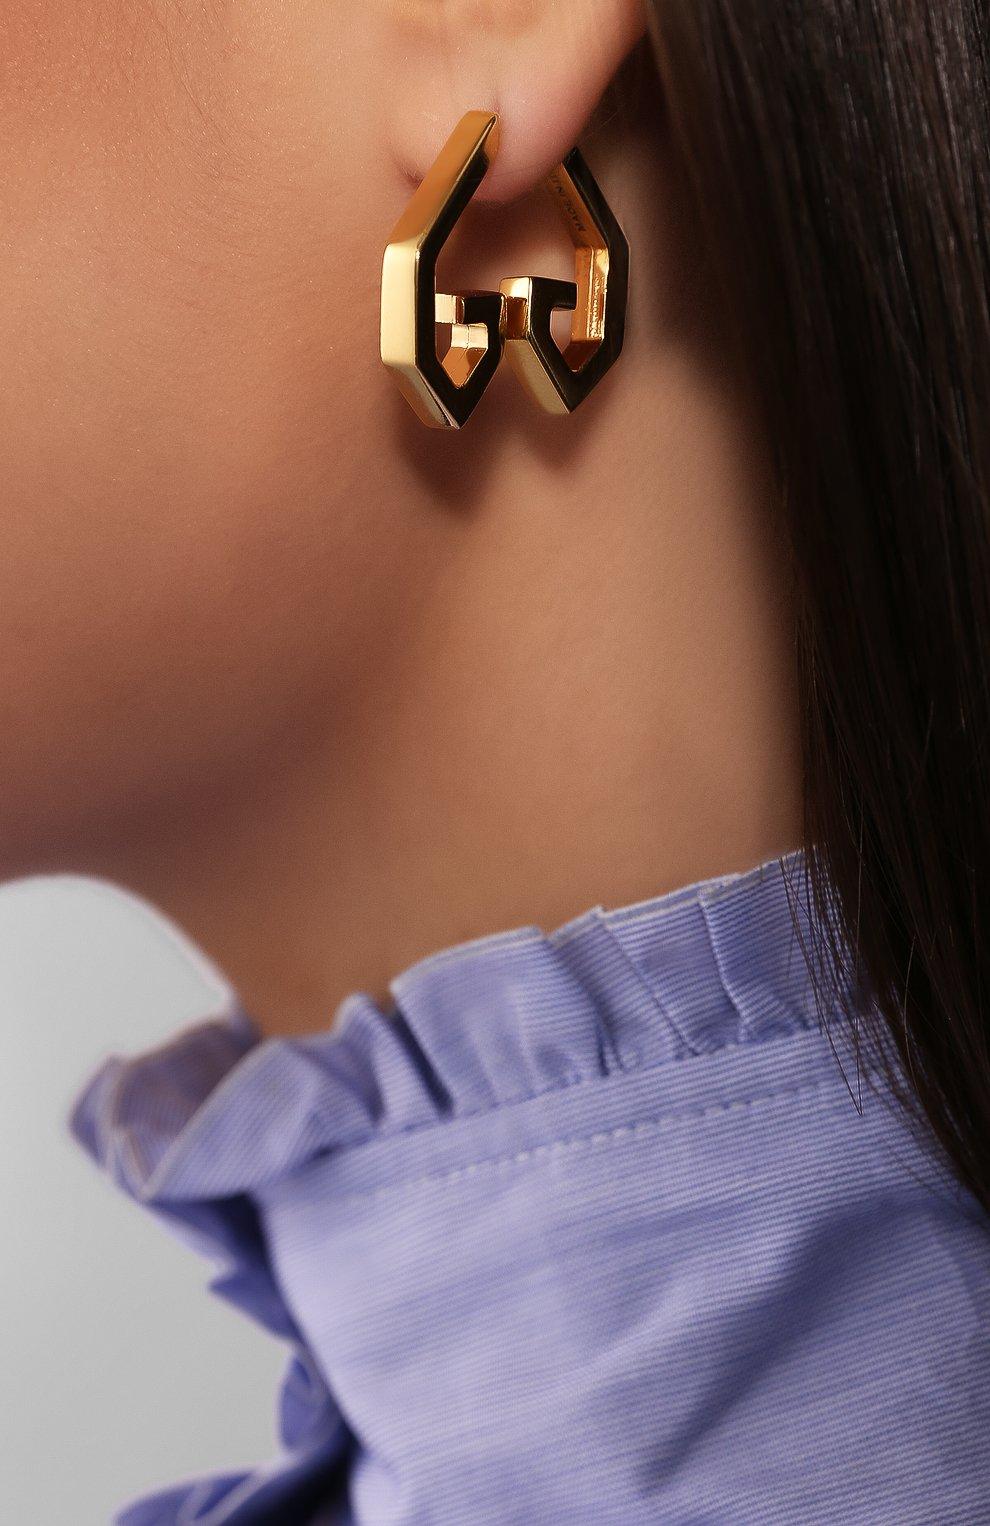 Серьги GV Heart Givenchy золотые | Фото №2